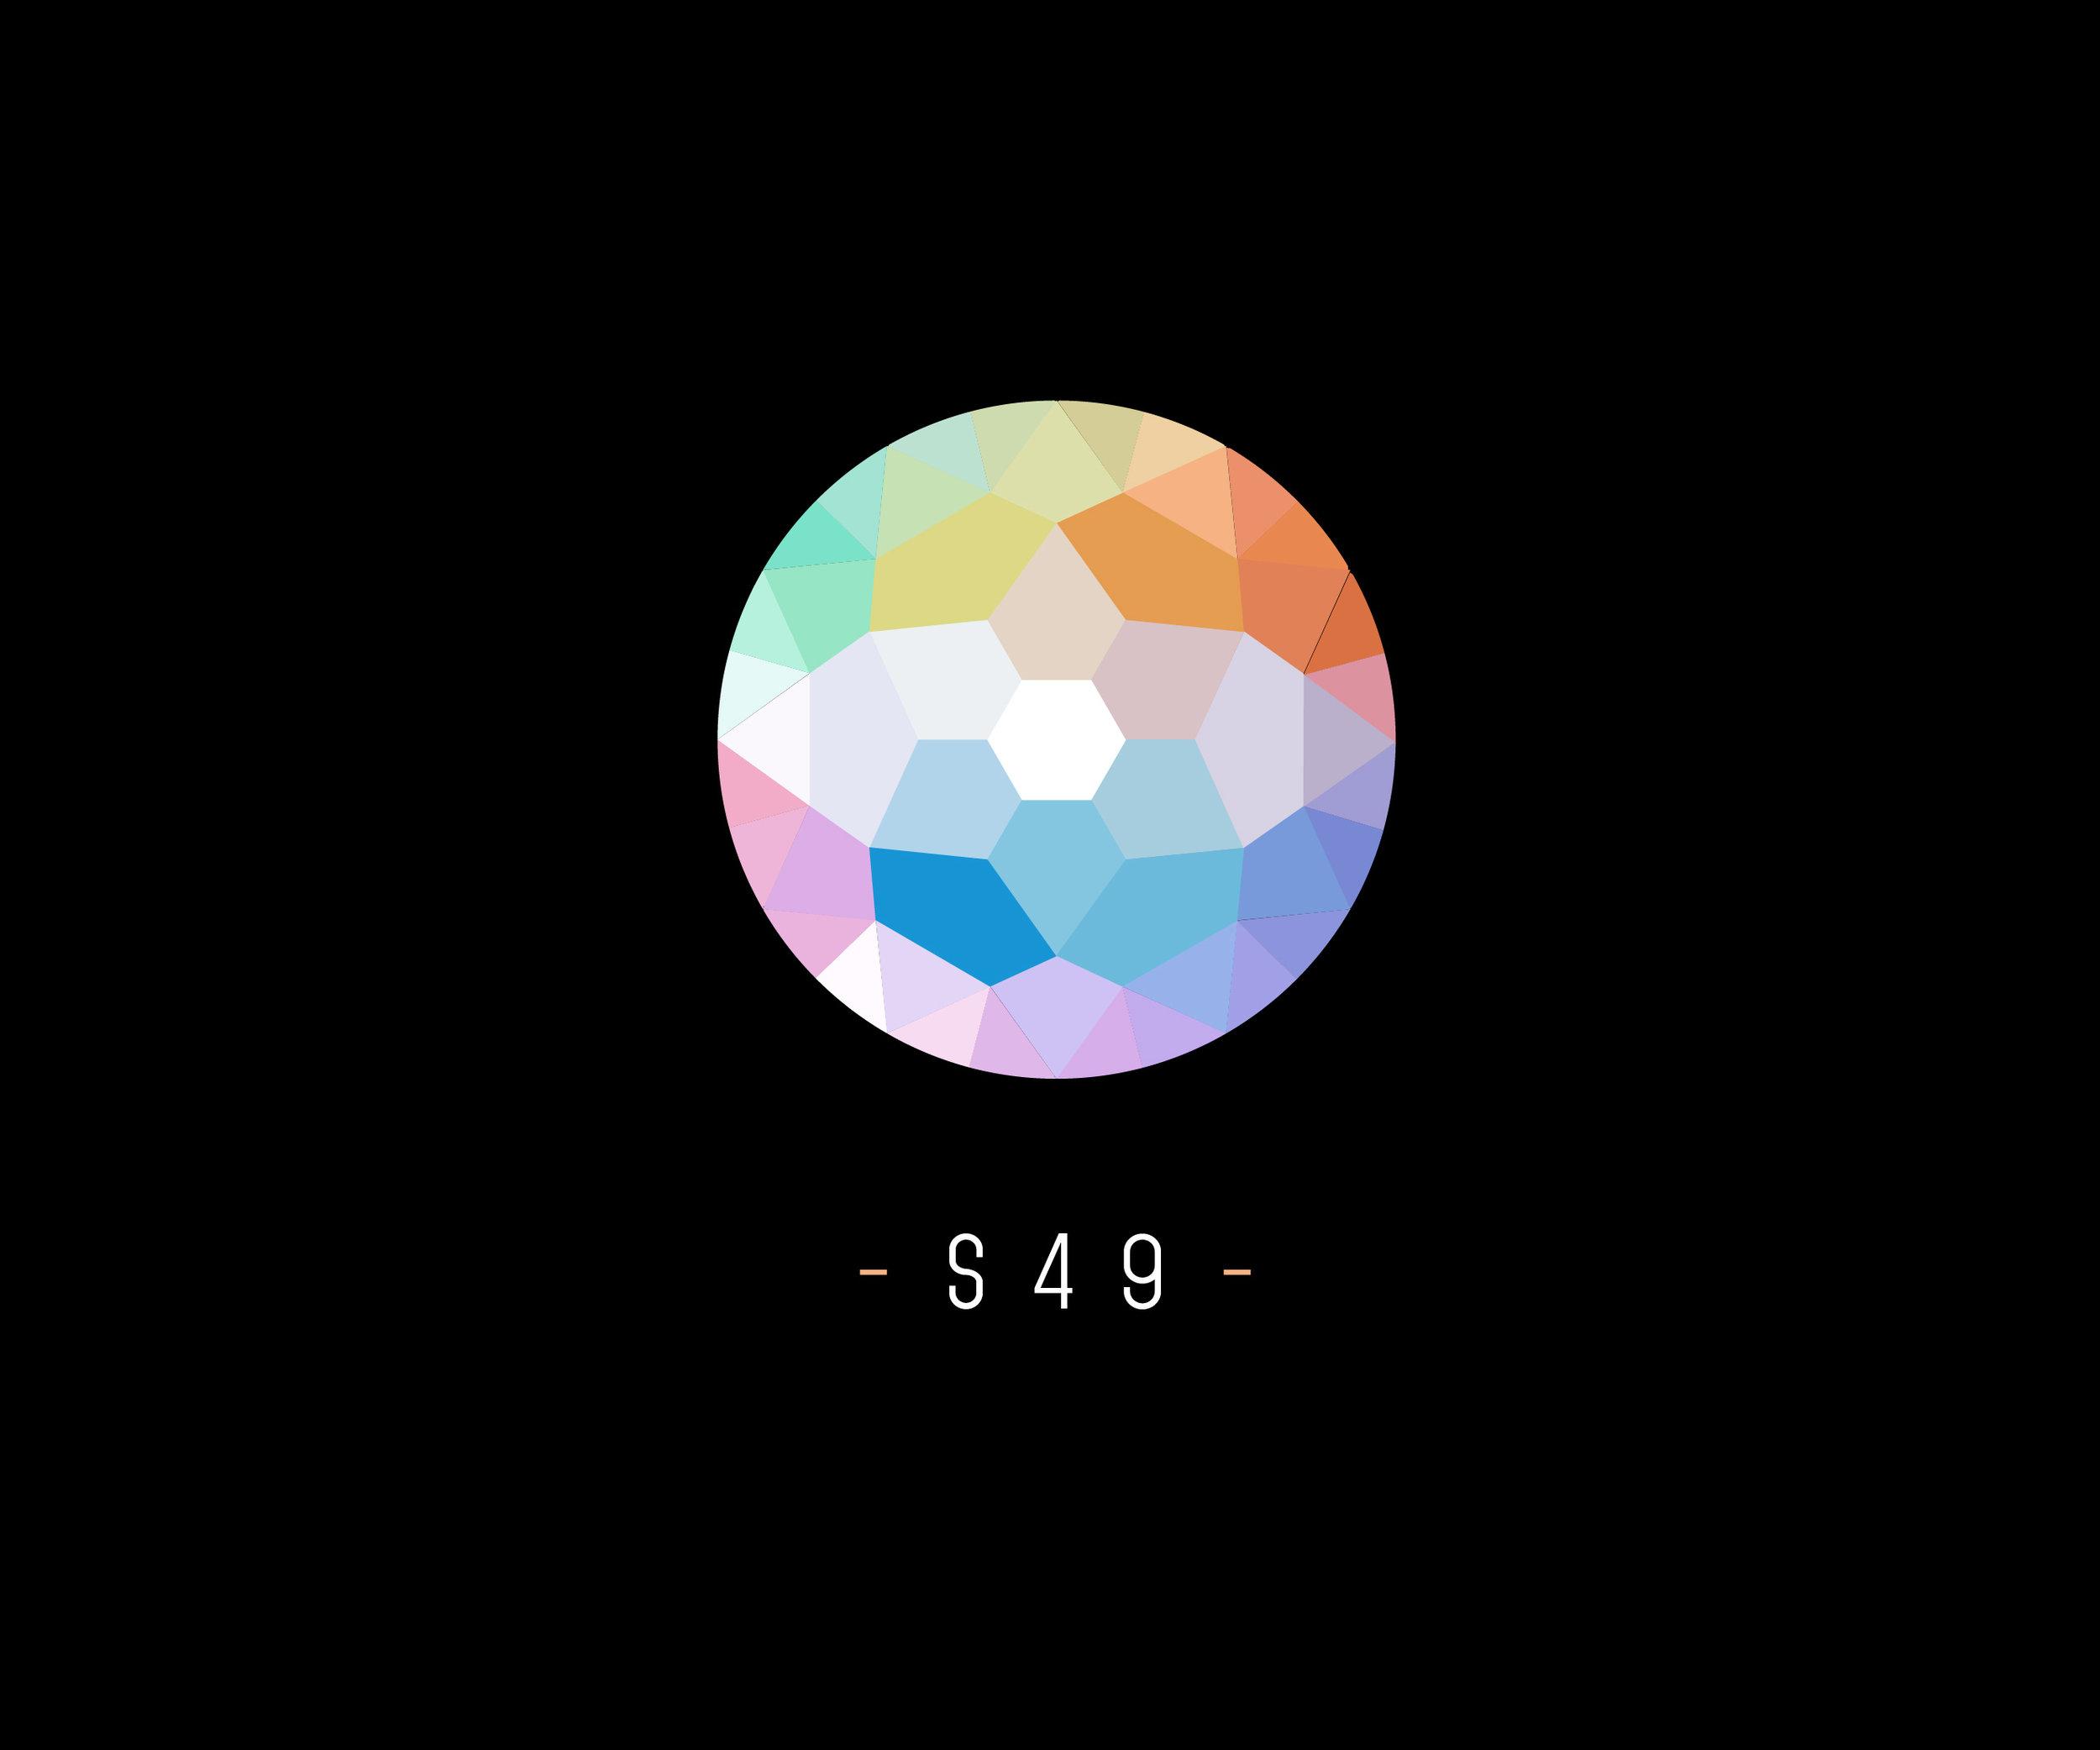 S49_Kaleidoscope-14.jpg